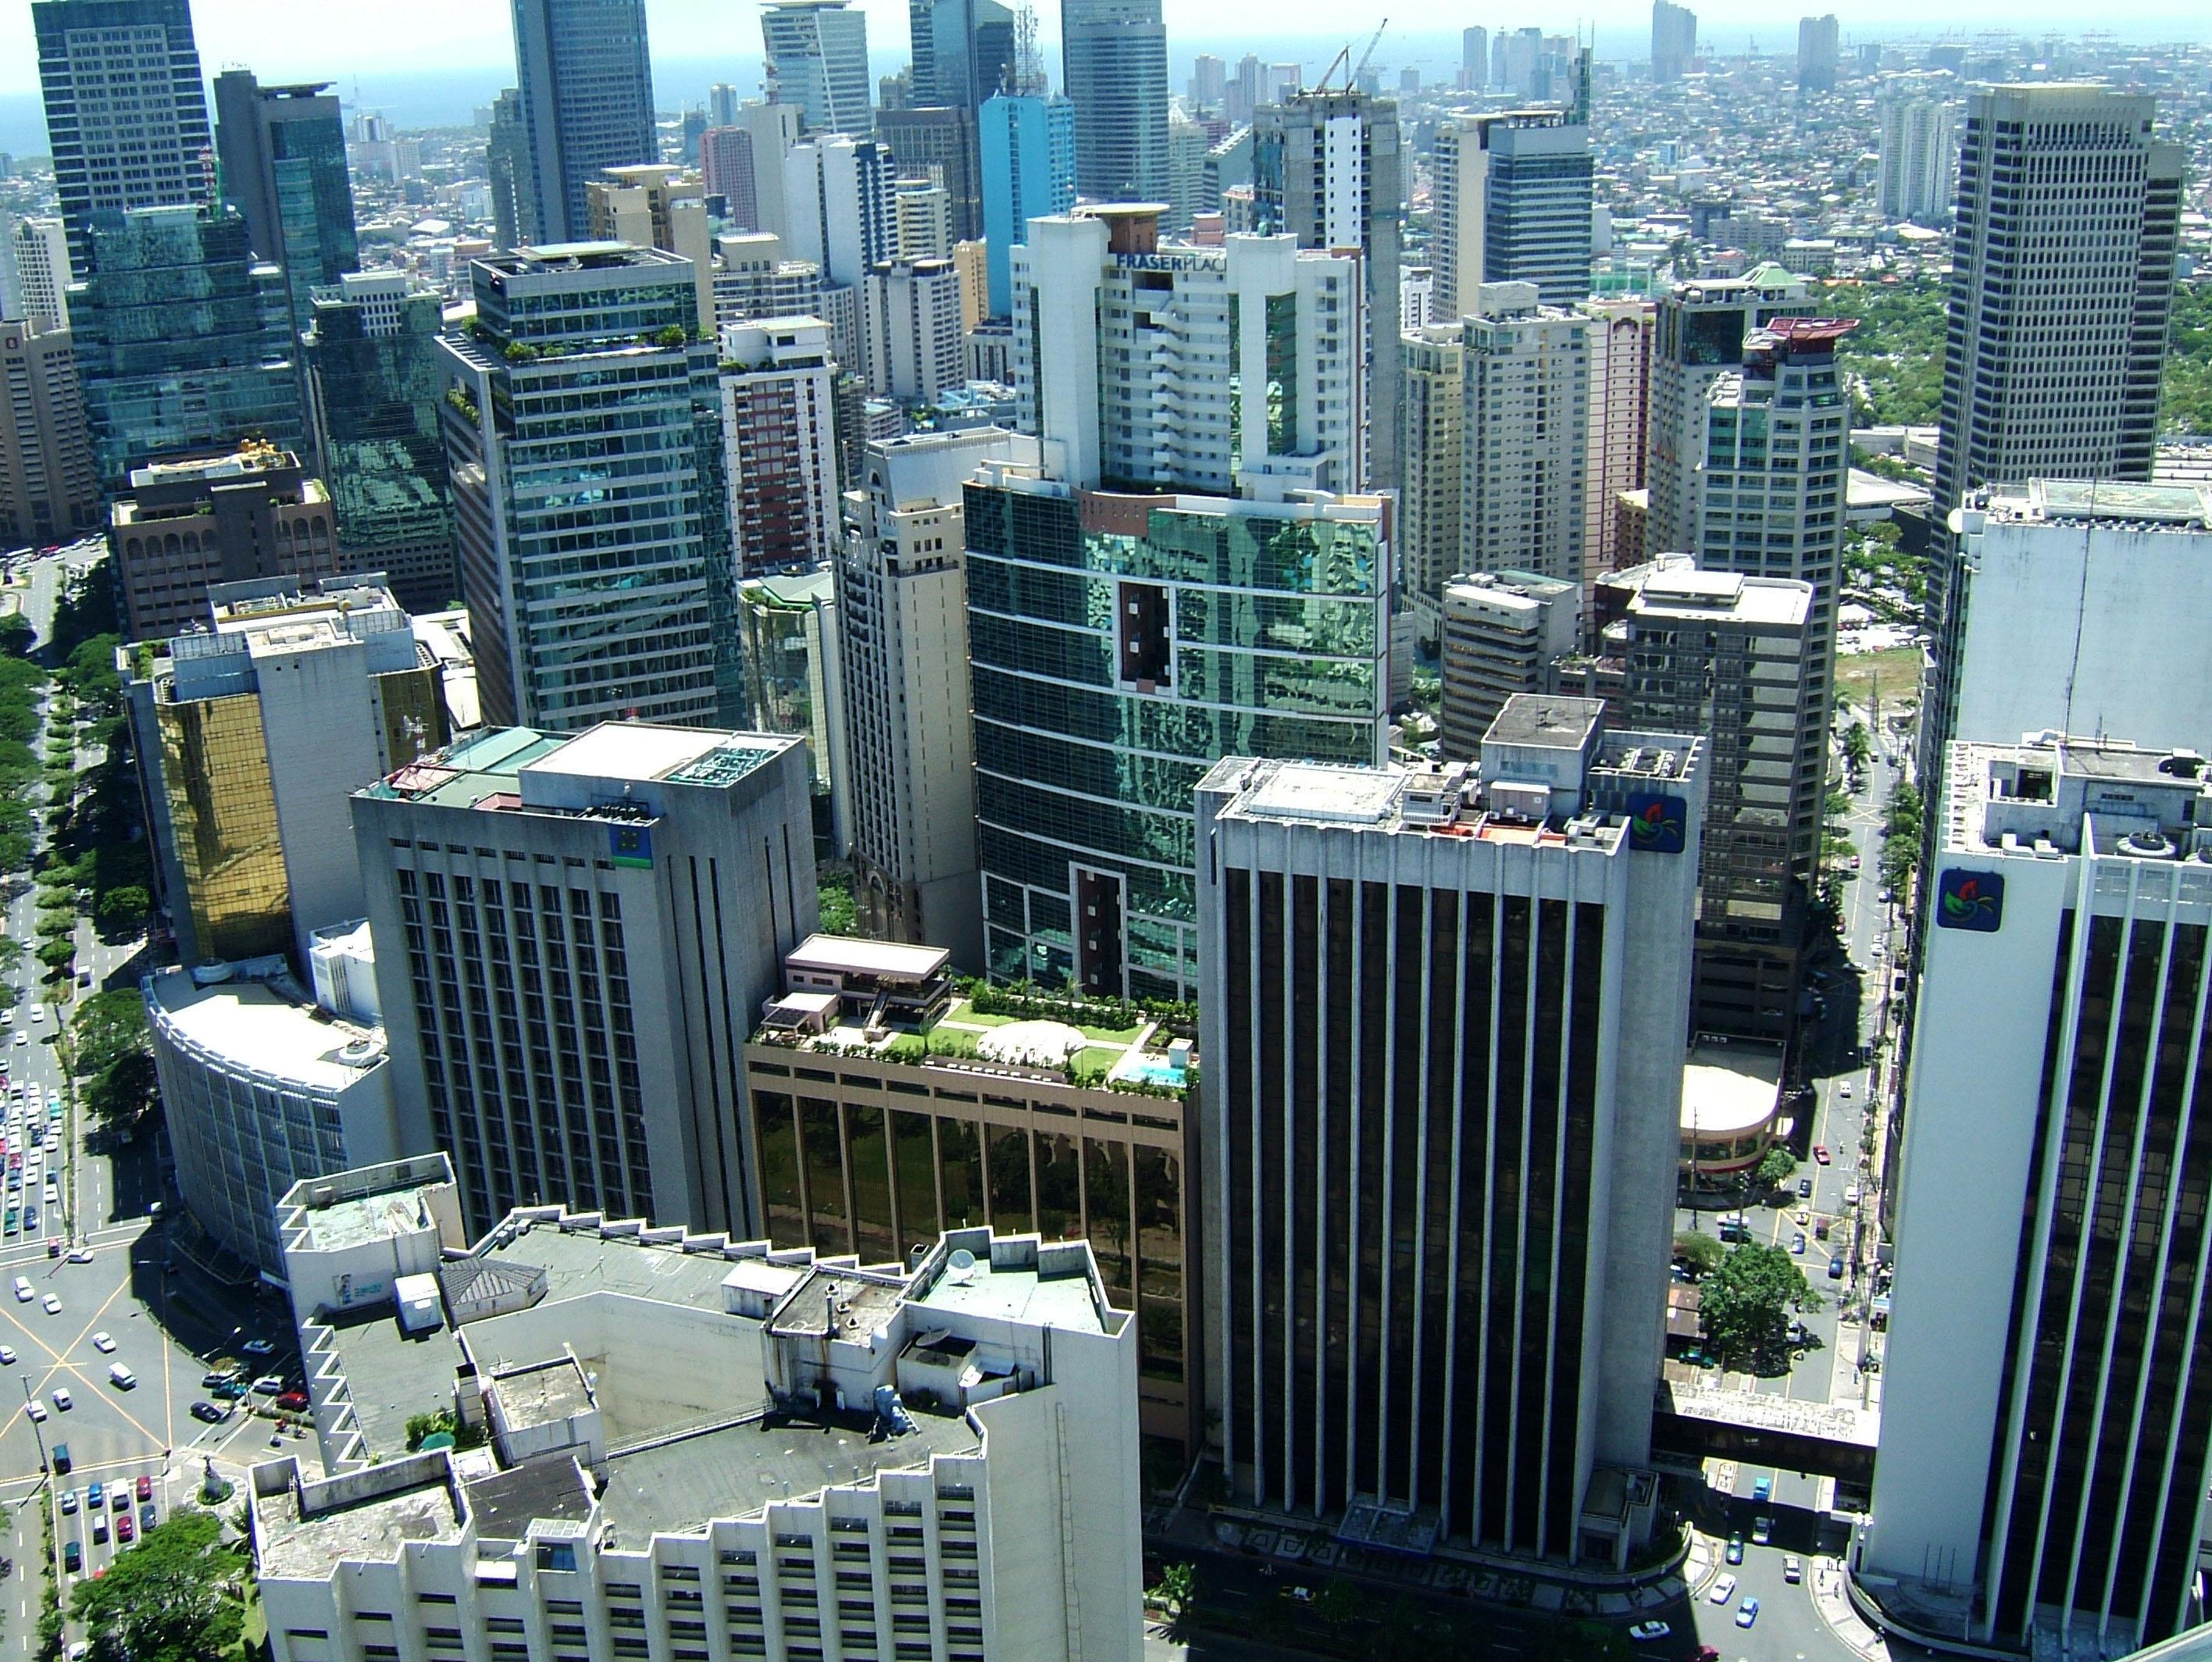 Despite tax reforms, PH can still be a BPO destination